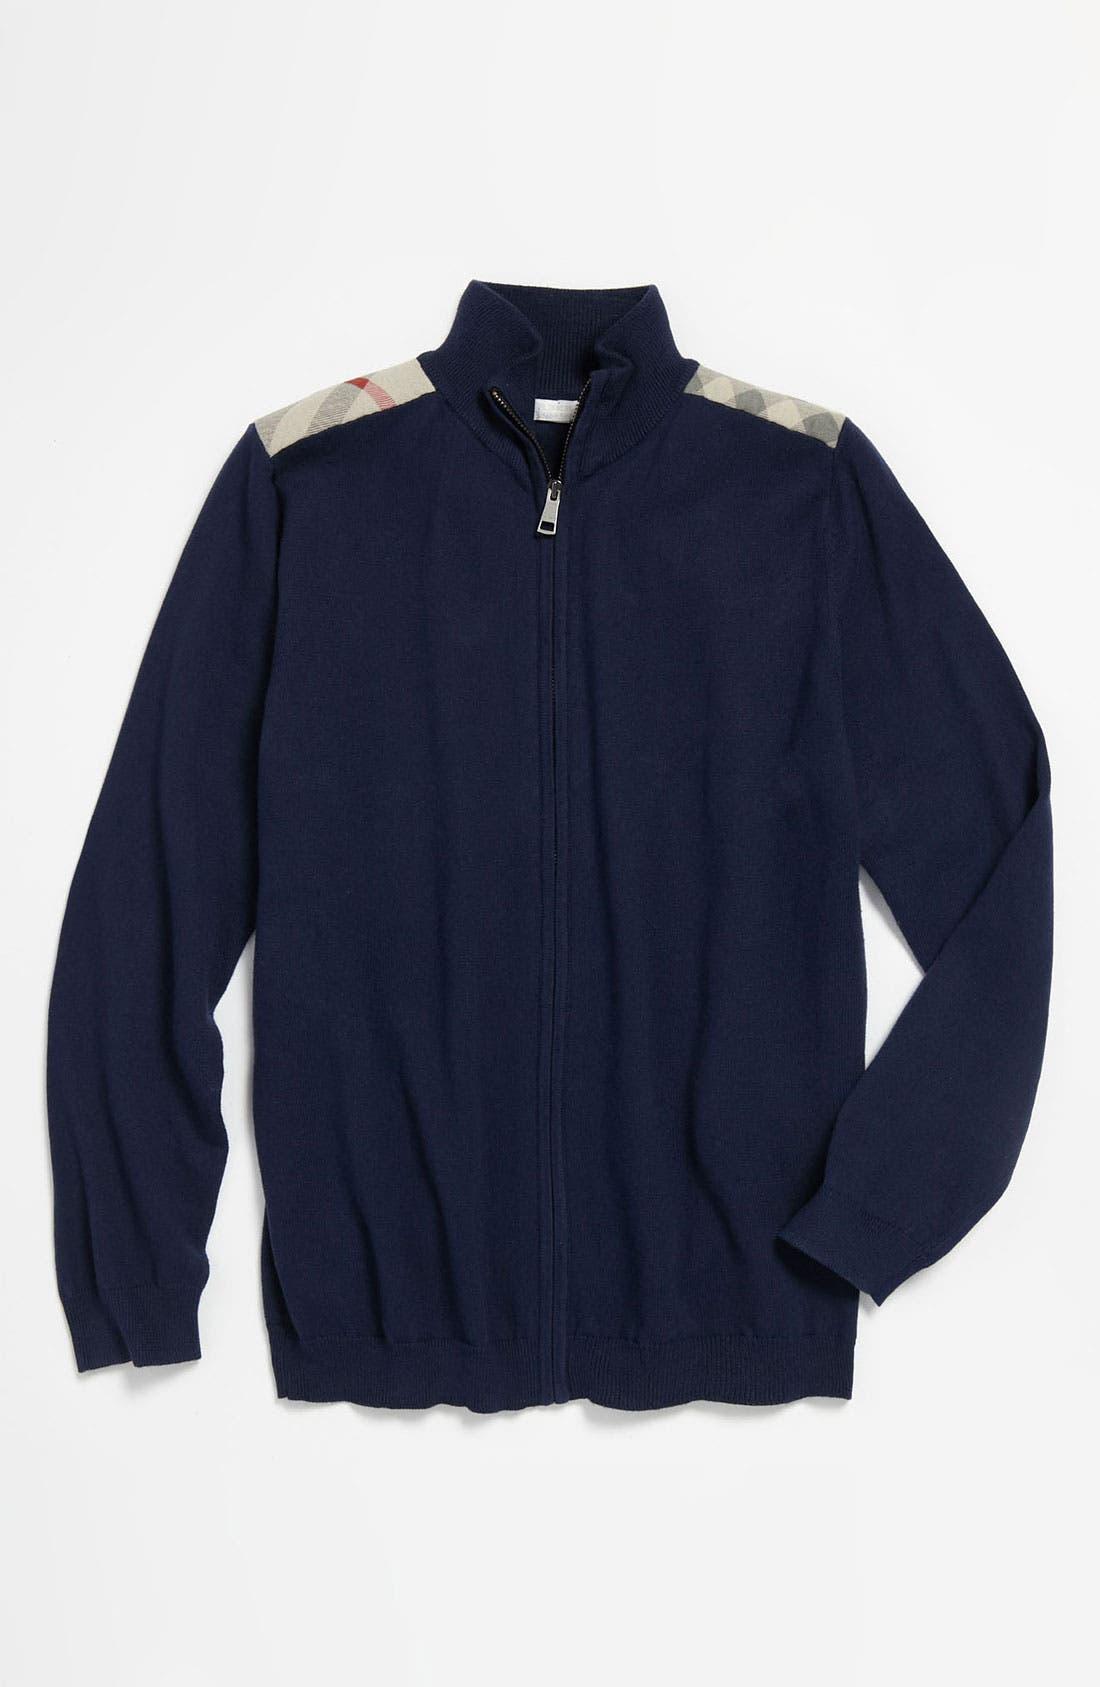 Main Image - Burberry High Neck Sweater (Little Boys & Big Boys)